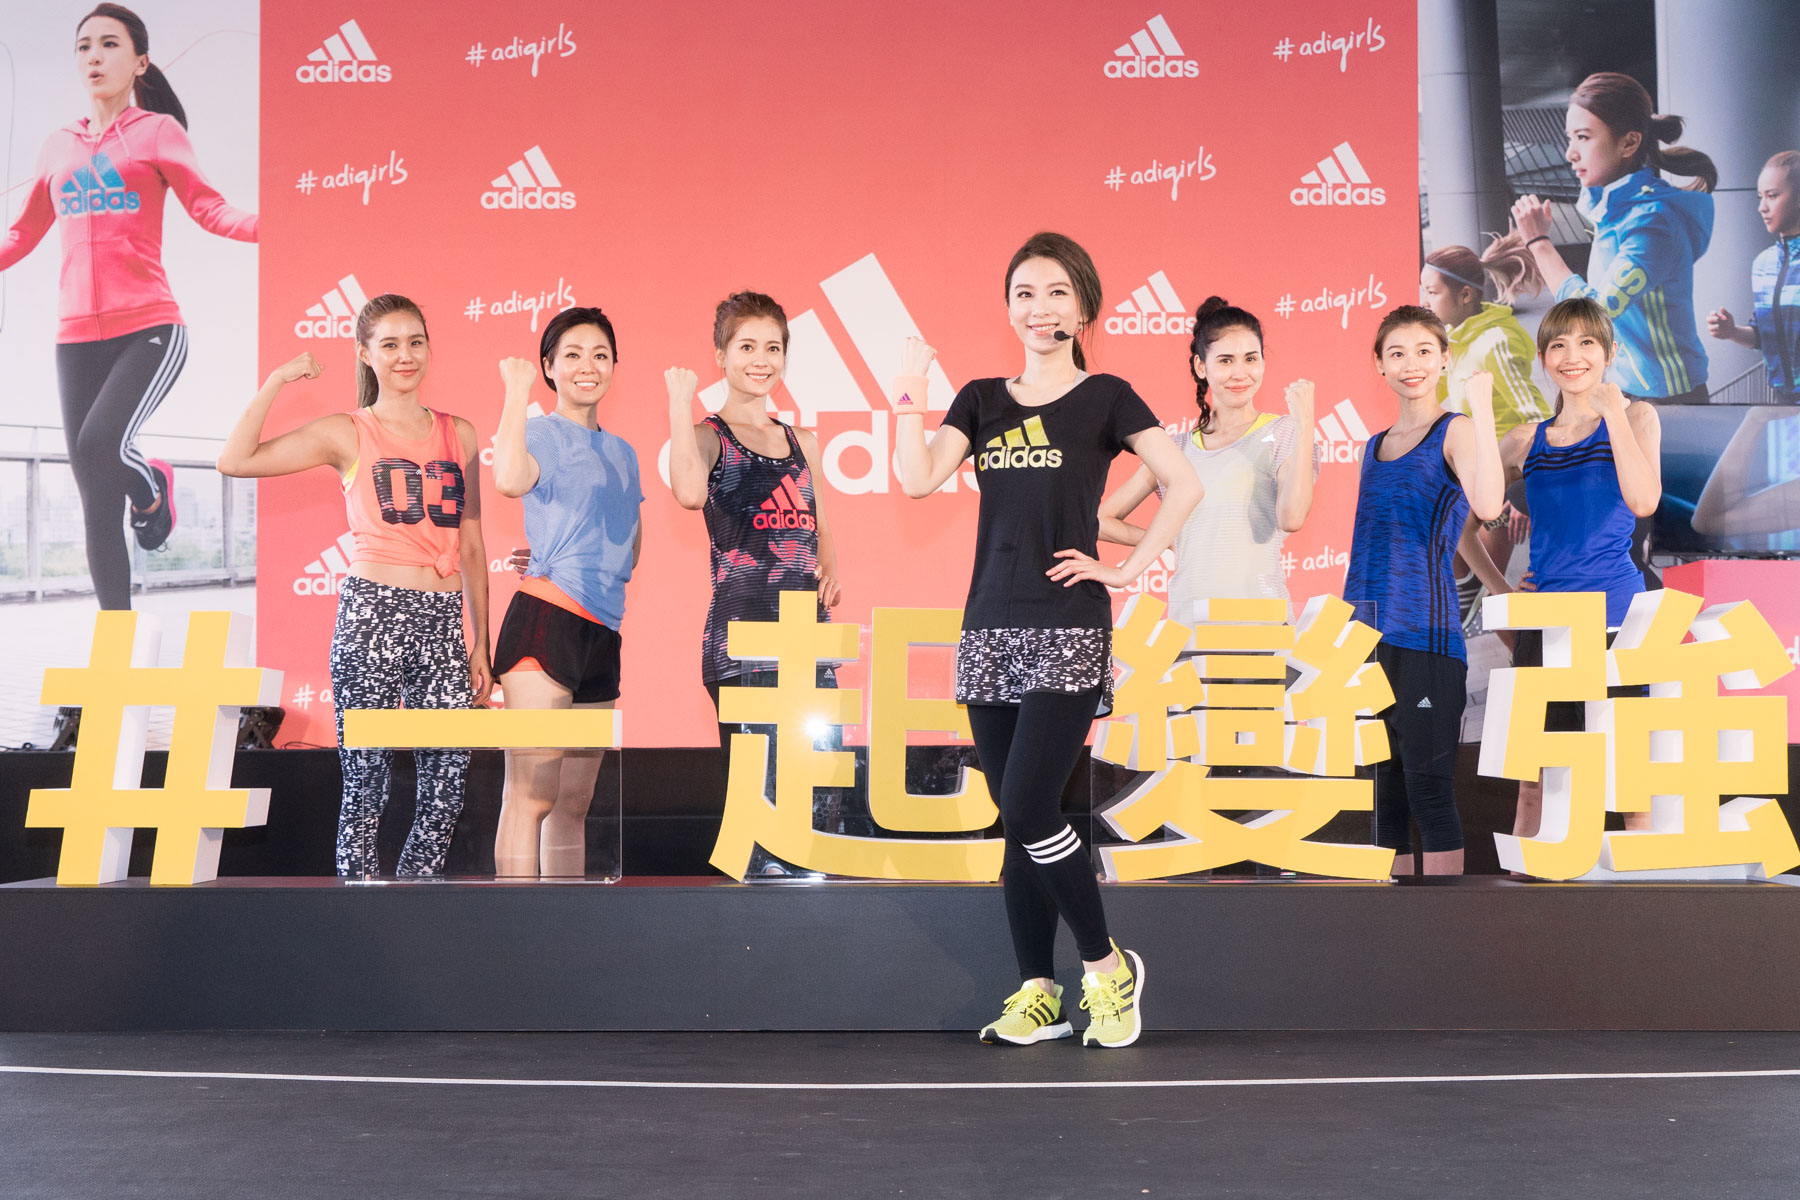 adidas-adigirls press conference 20150924-13